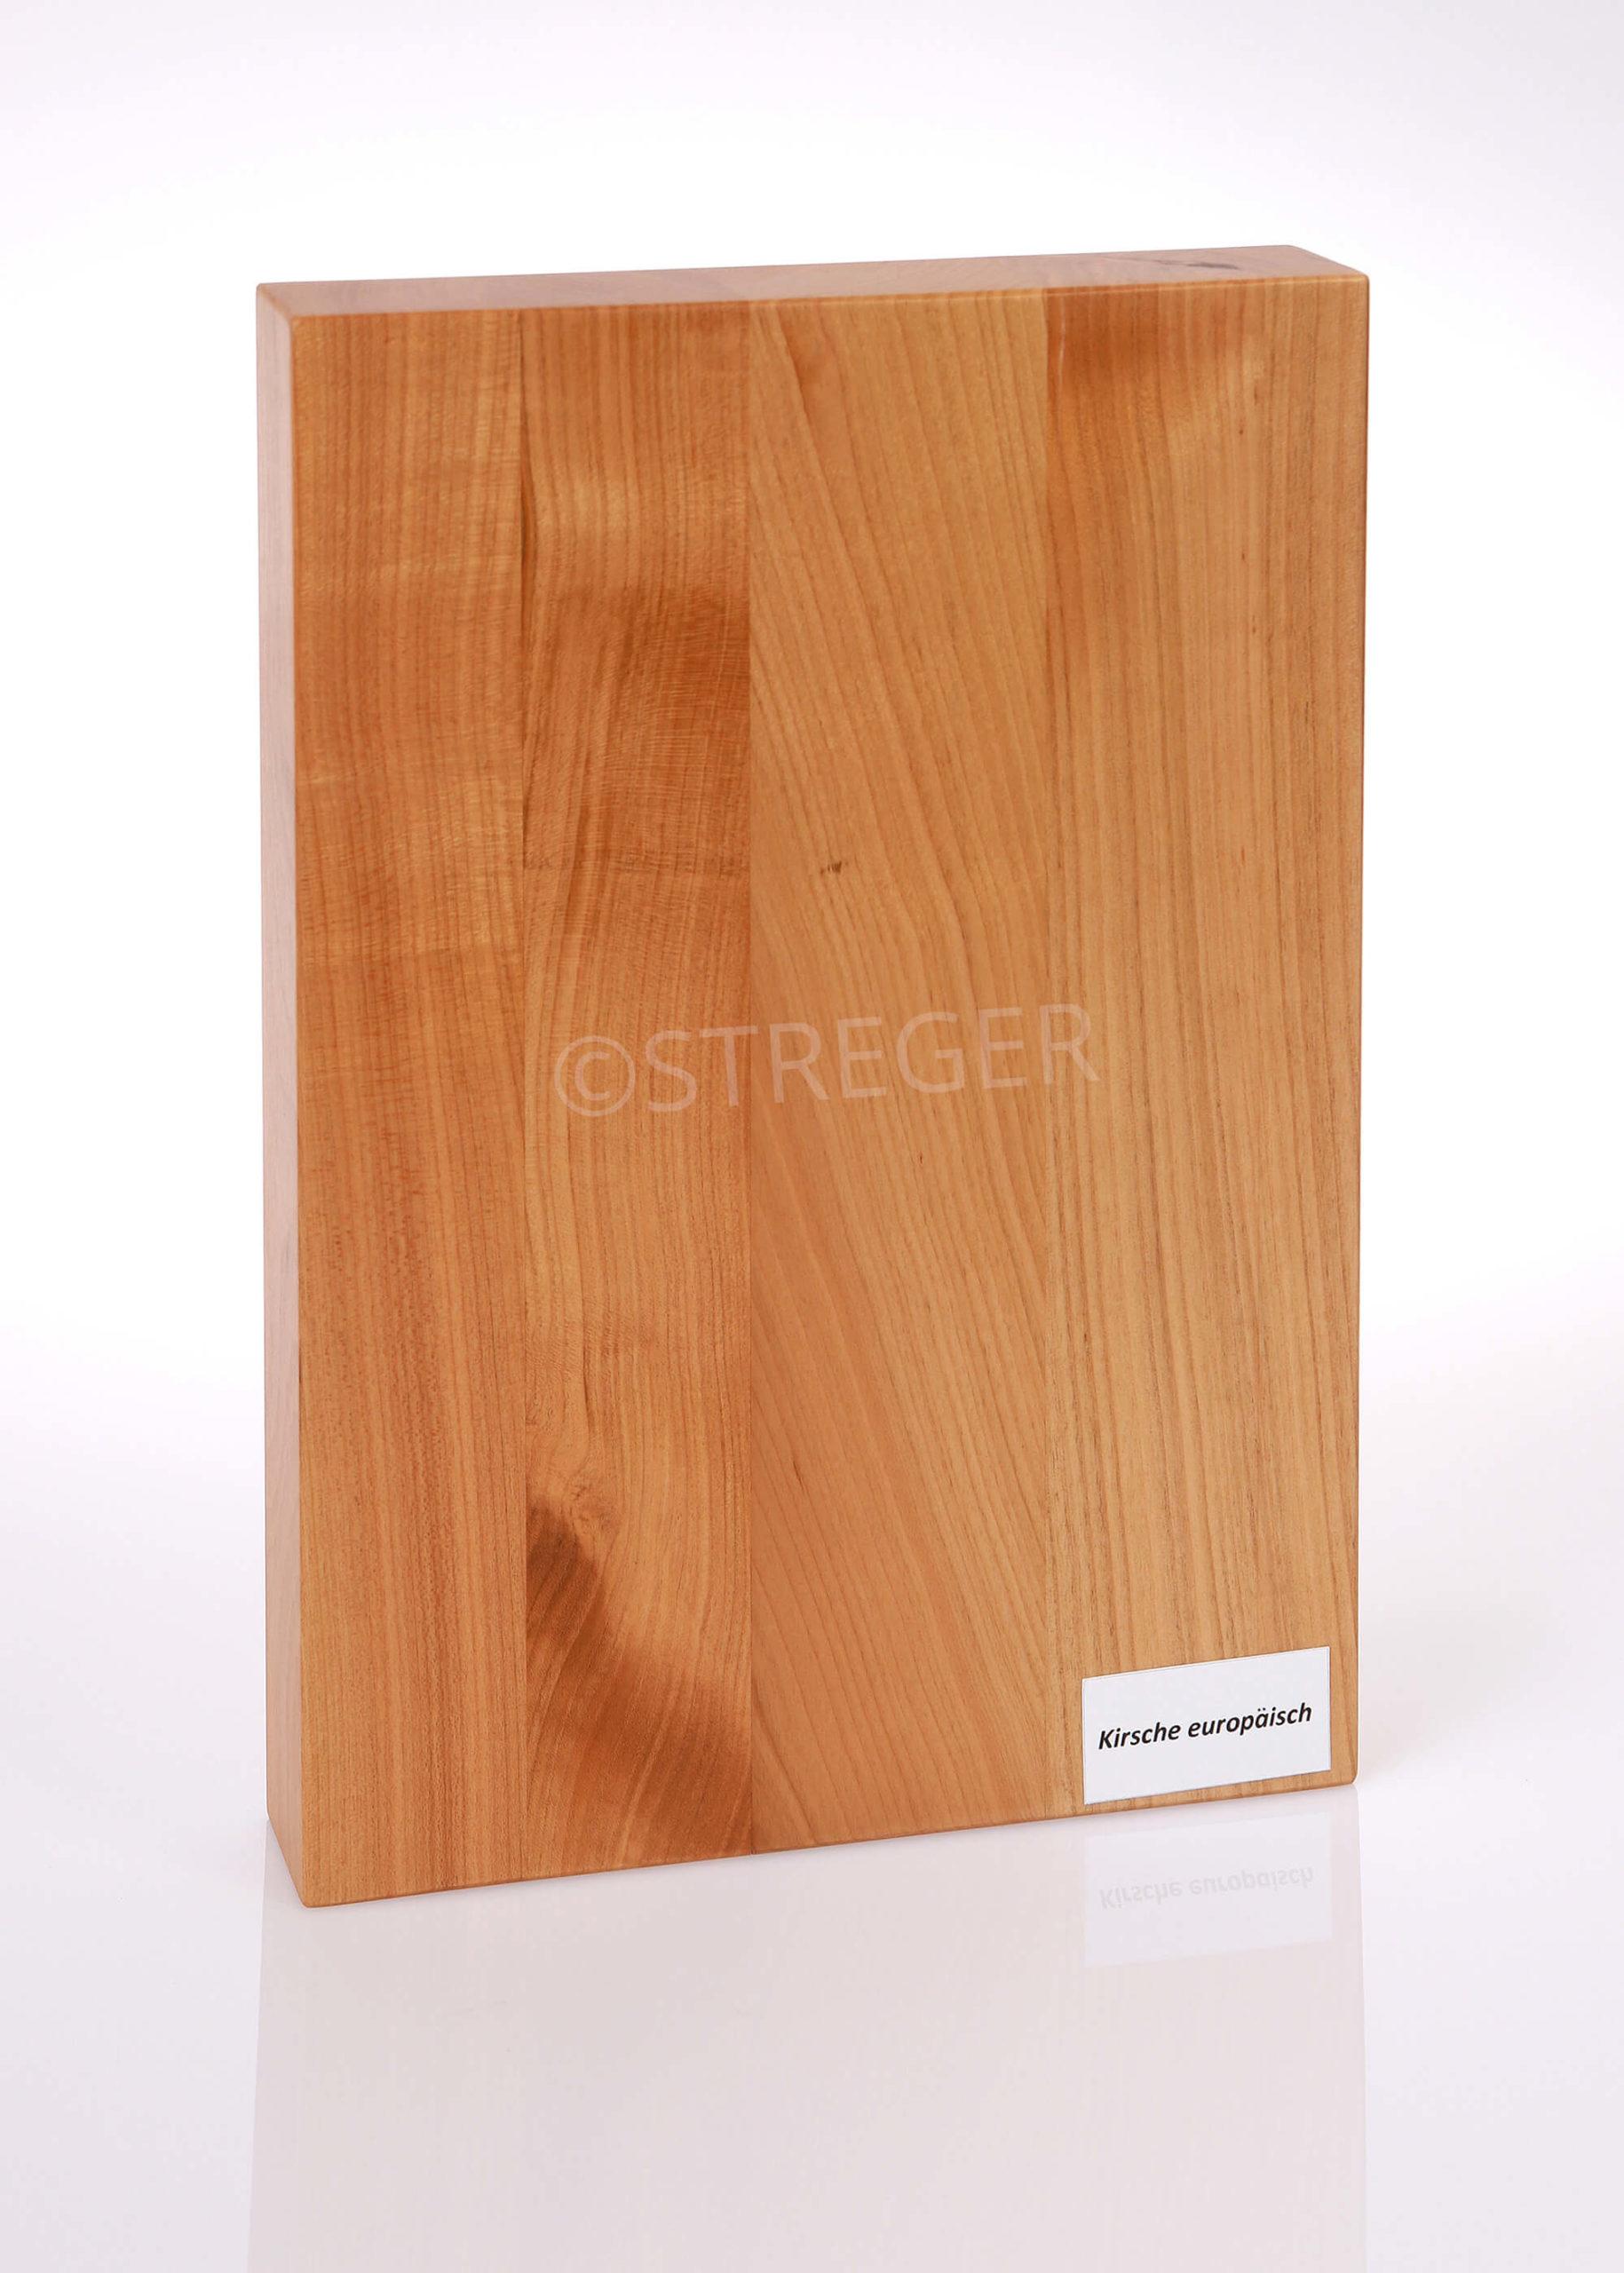 STREGER-Massivholztreppen-Kirsche-europaeisch